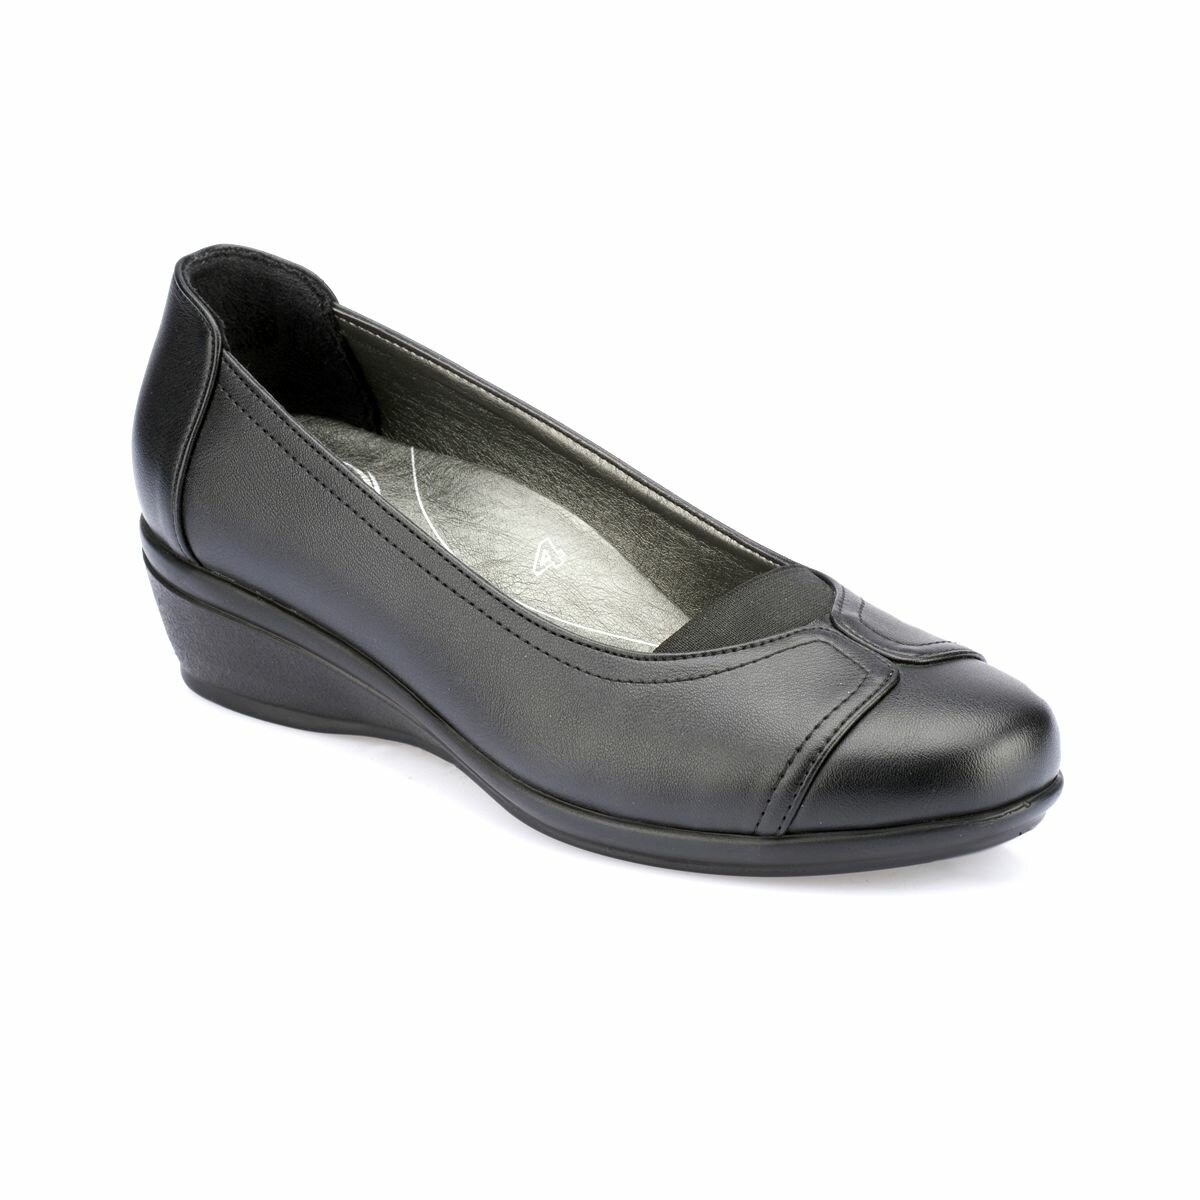 FLO 82. 100113.Z Black Women Shoes Polaris 5 Point